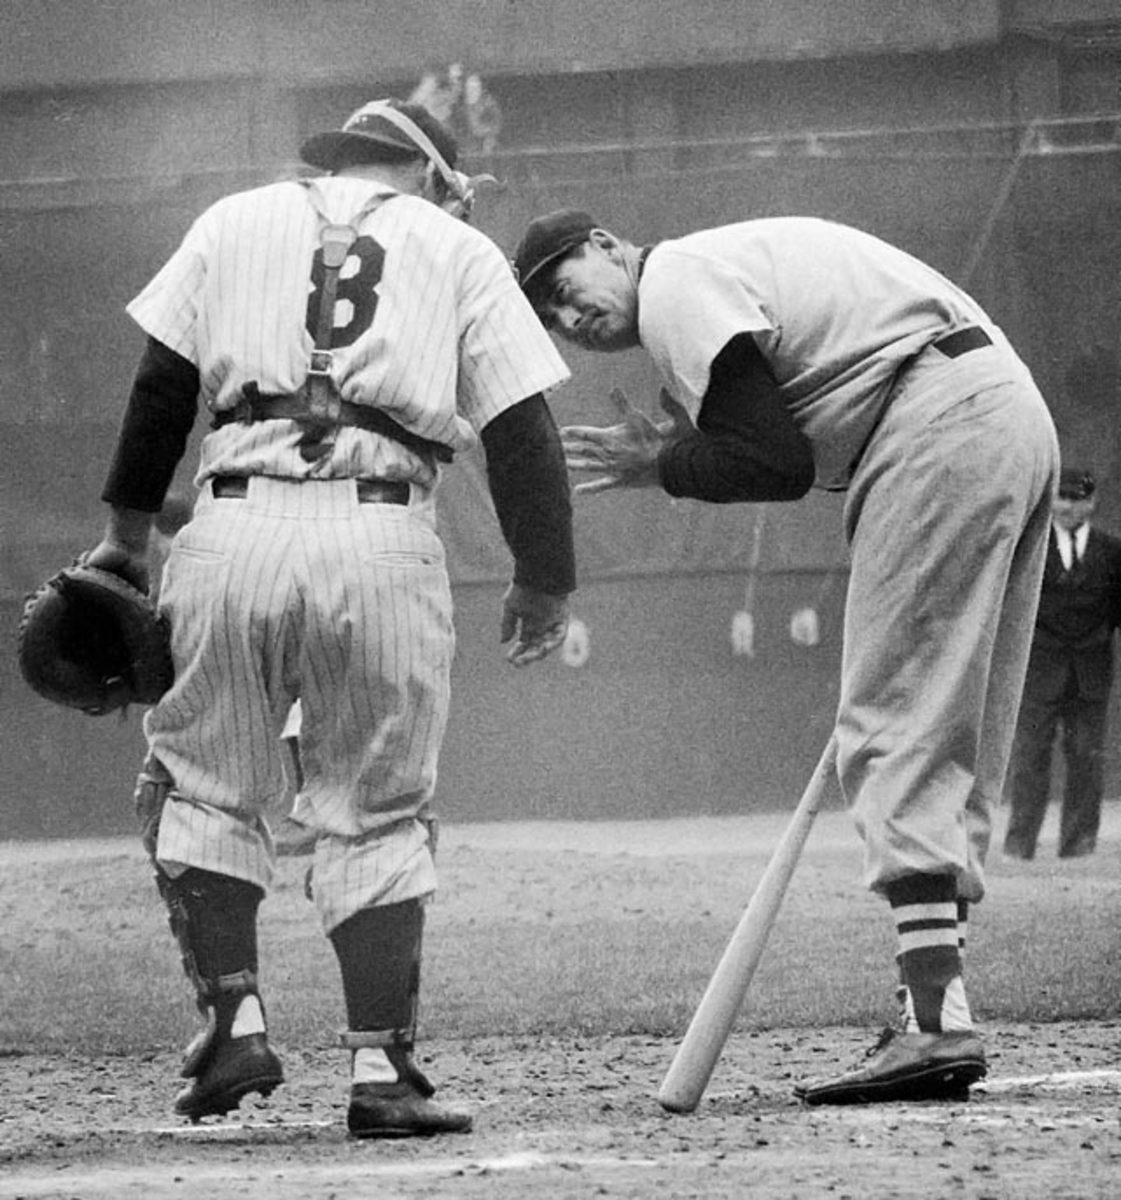 Yogi Berra and Ted Williams